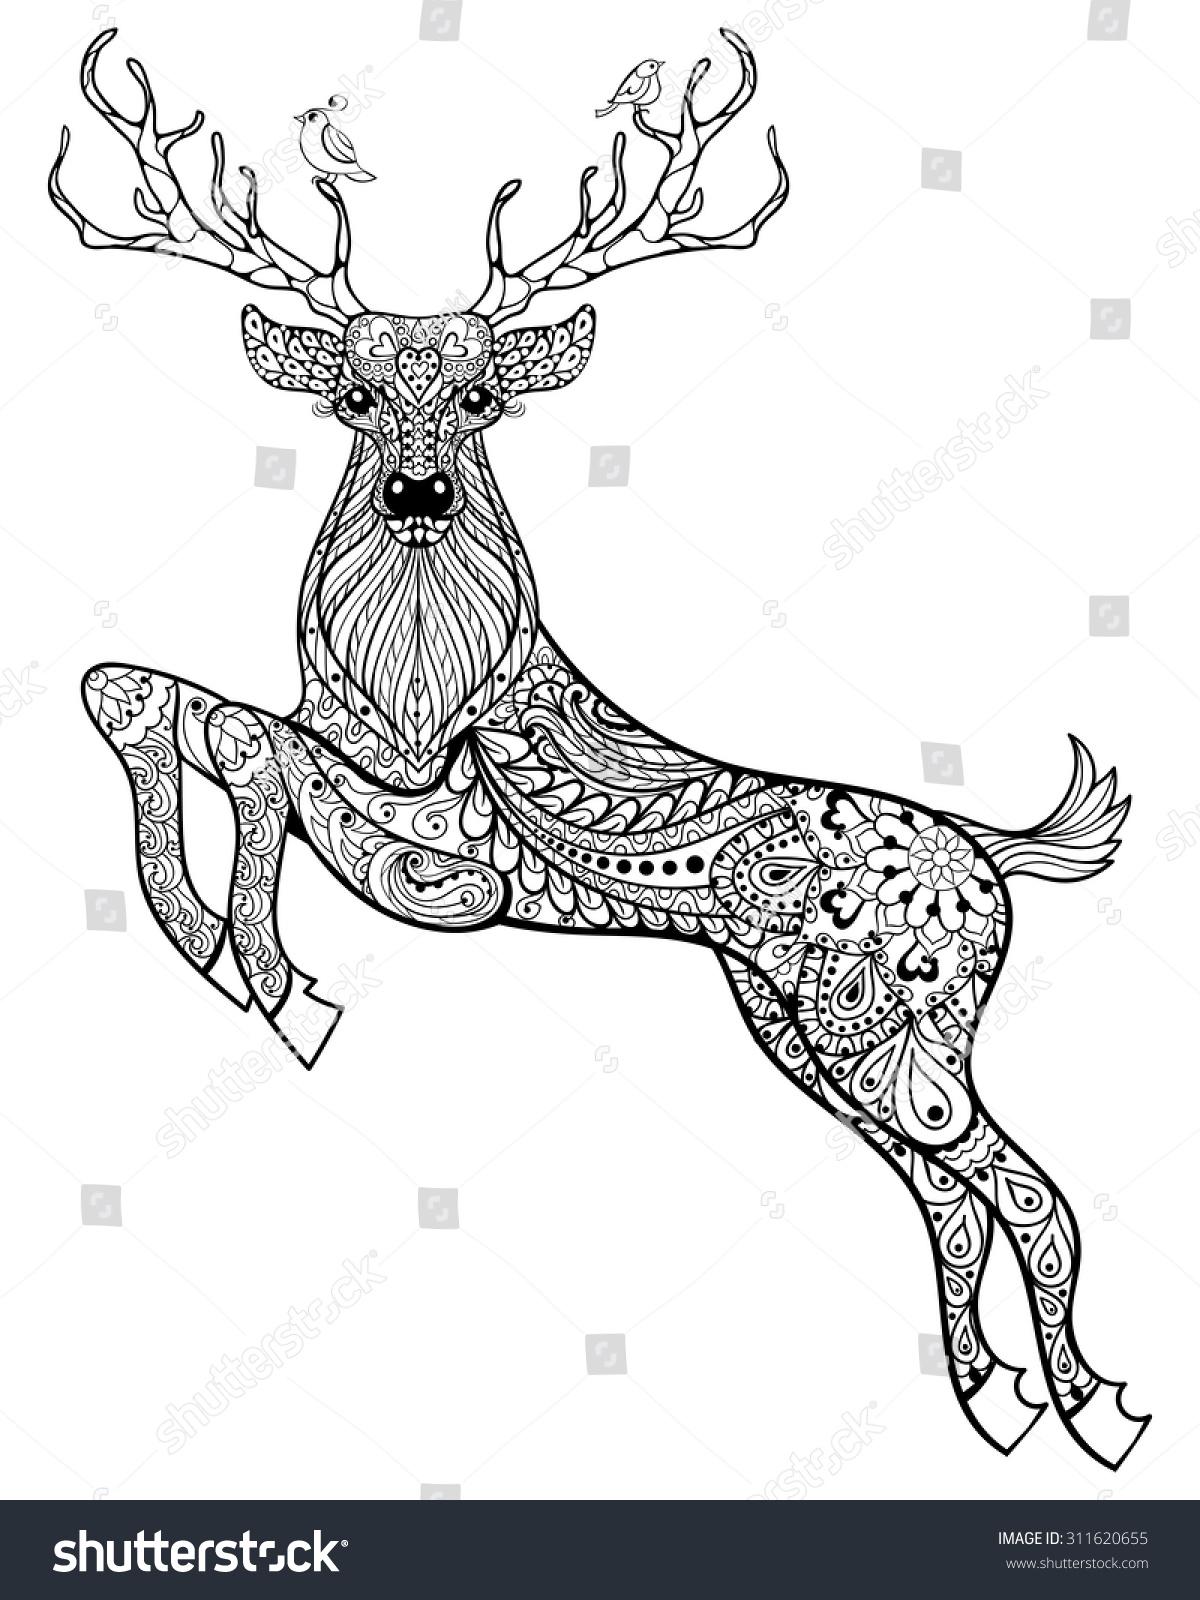 Deer Hand Drawn Christmas Magic Horned Stock Vector 311620655